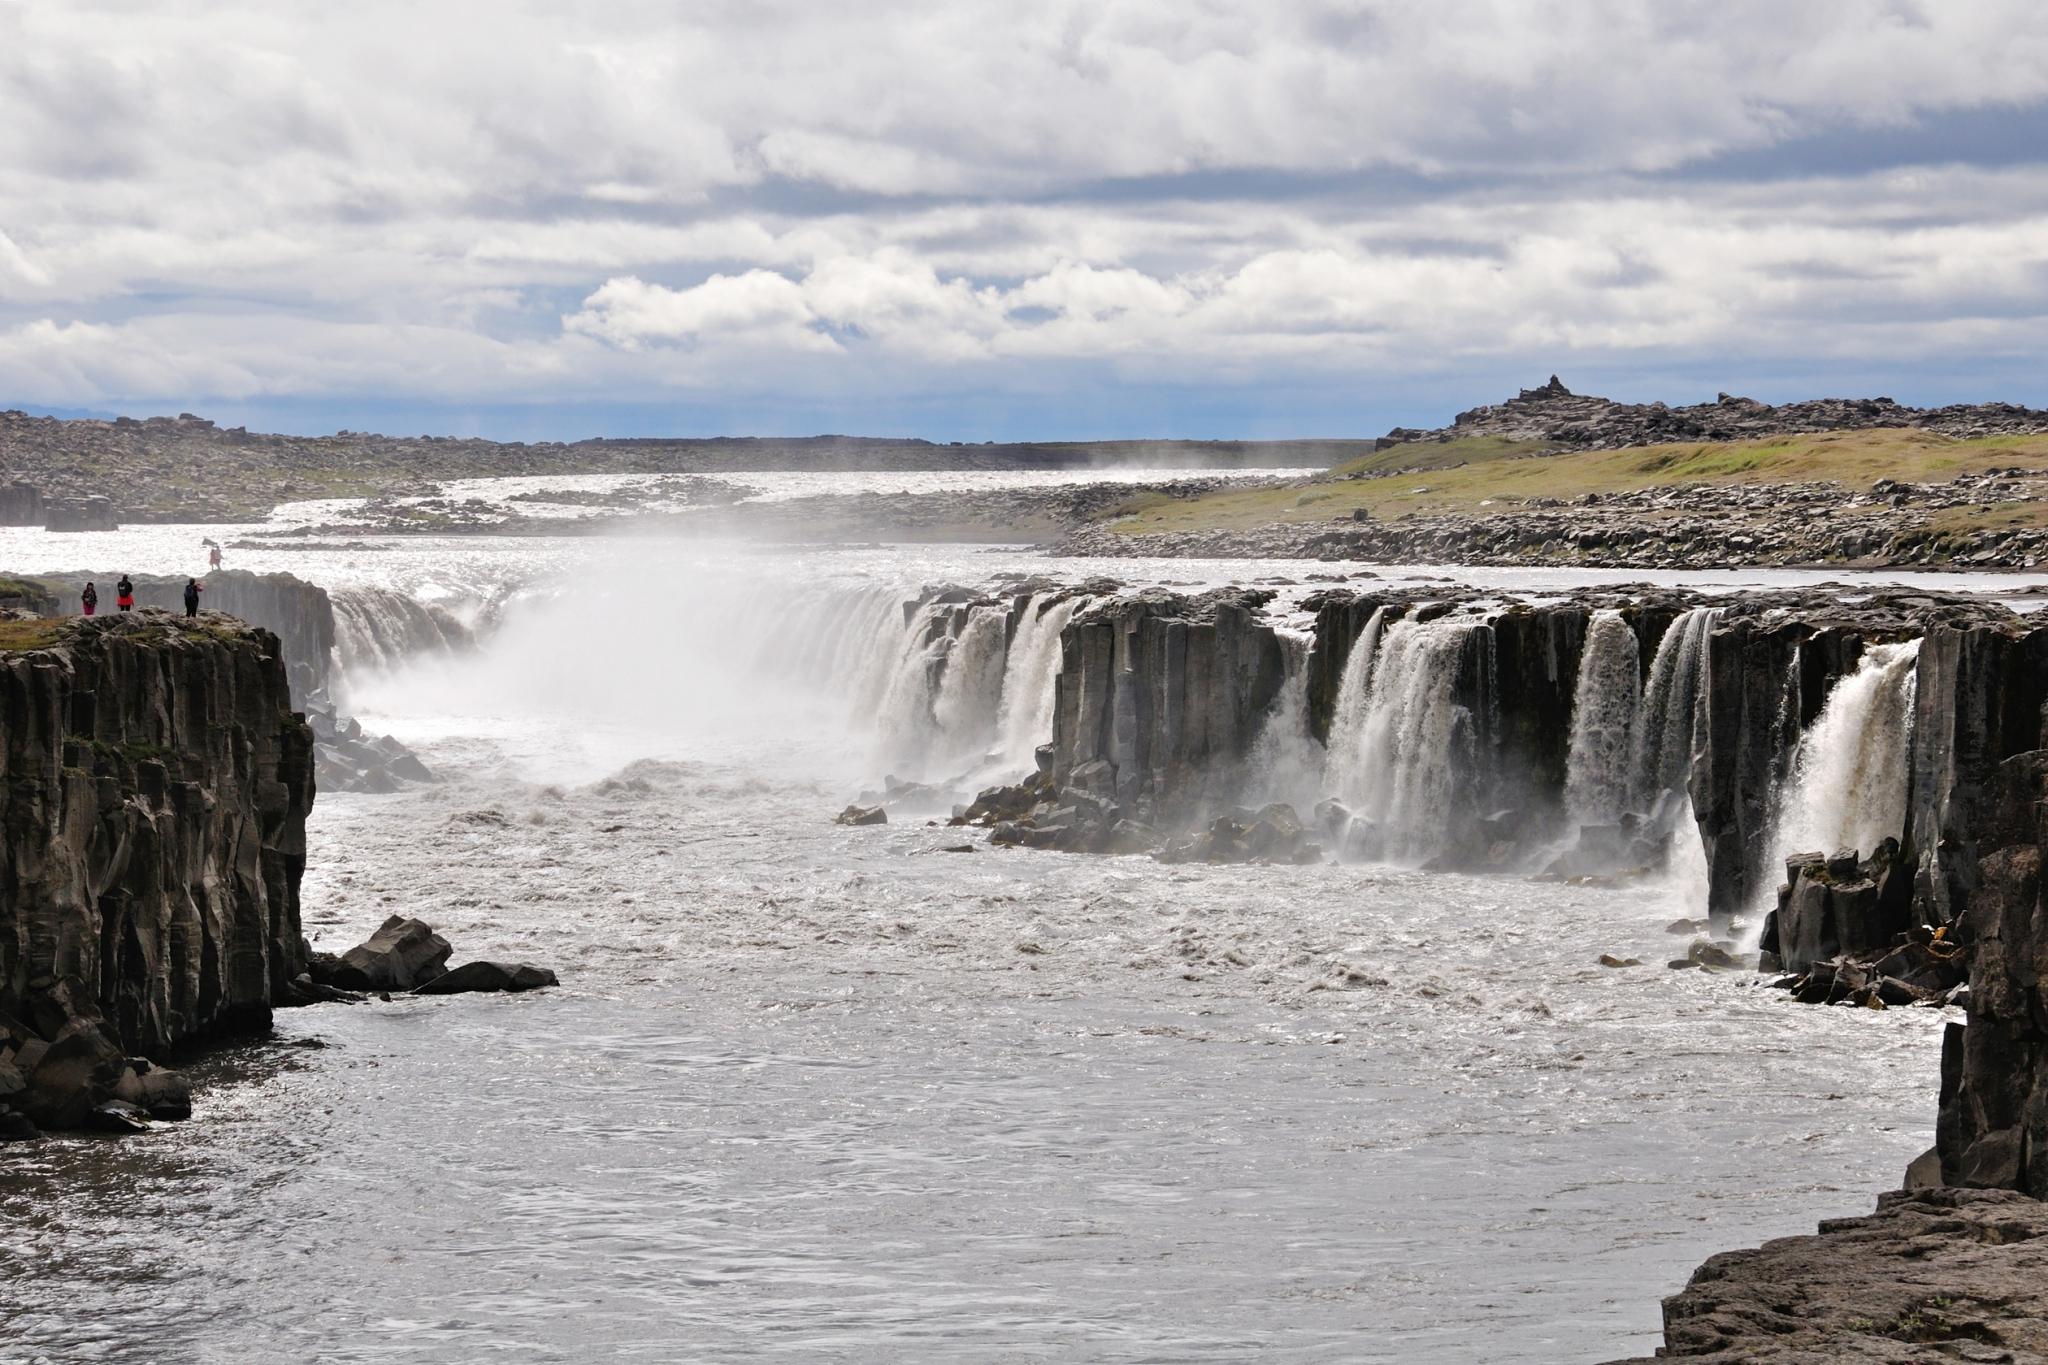 HOELLINGER Sabine - Expo 2017 - Projection 3 - La cascade Selfoss (Islande)